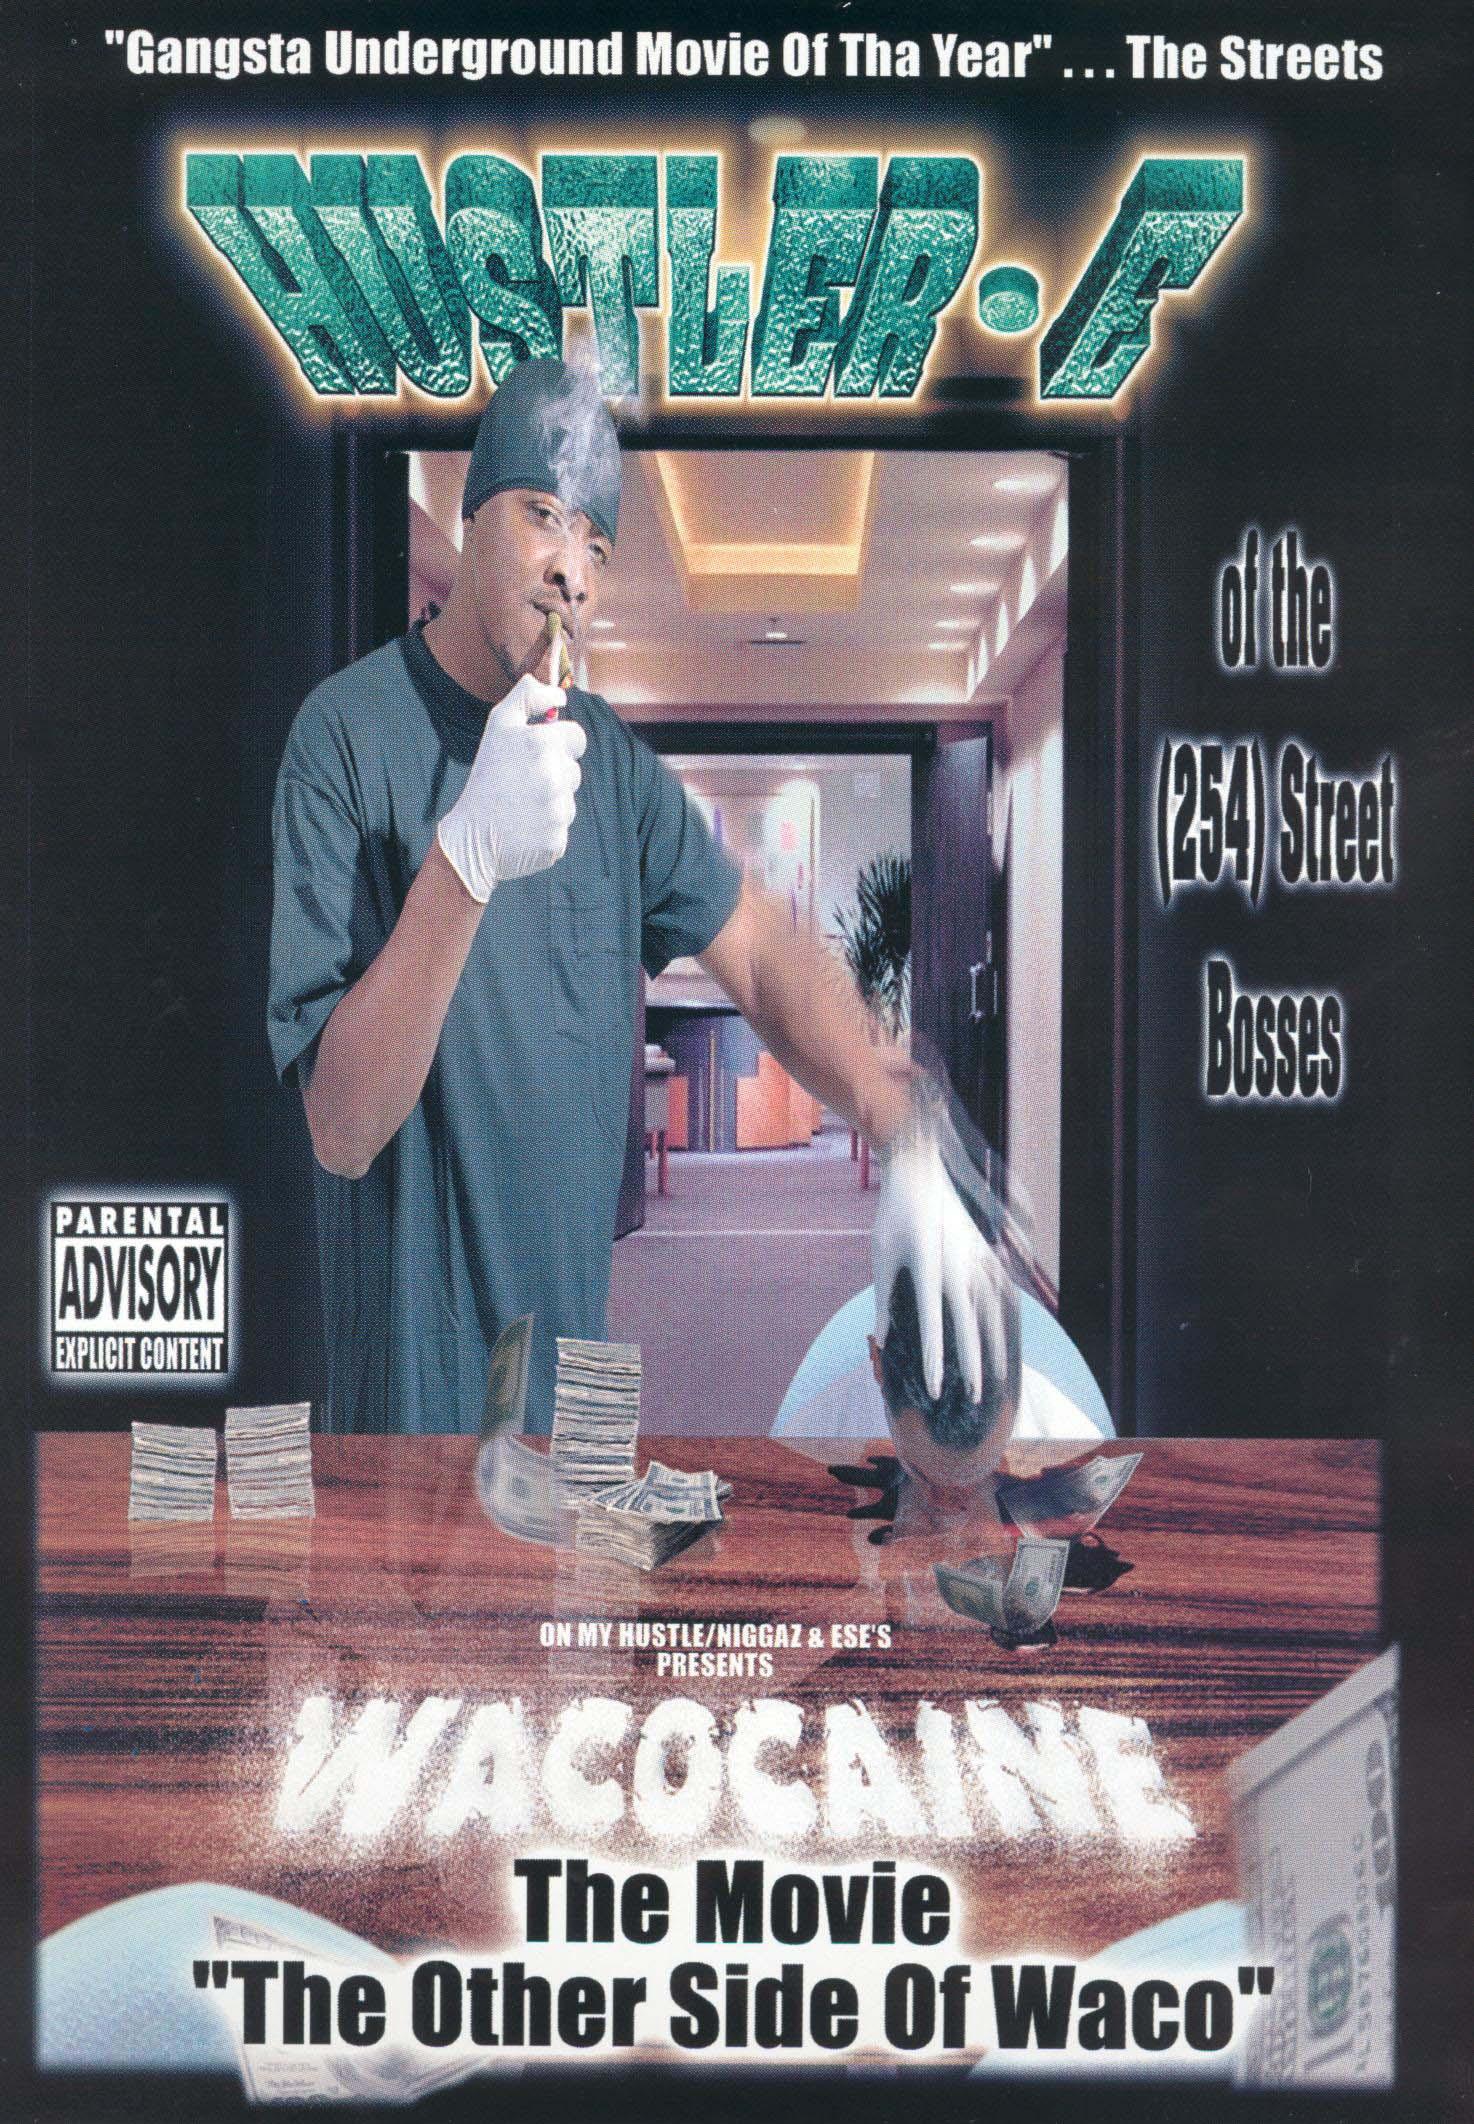 Hustler E: Wacocaine - The Movie